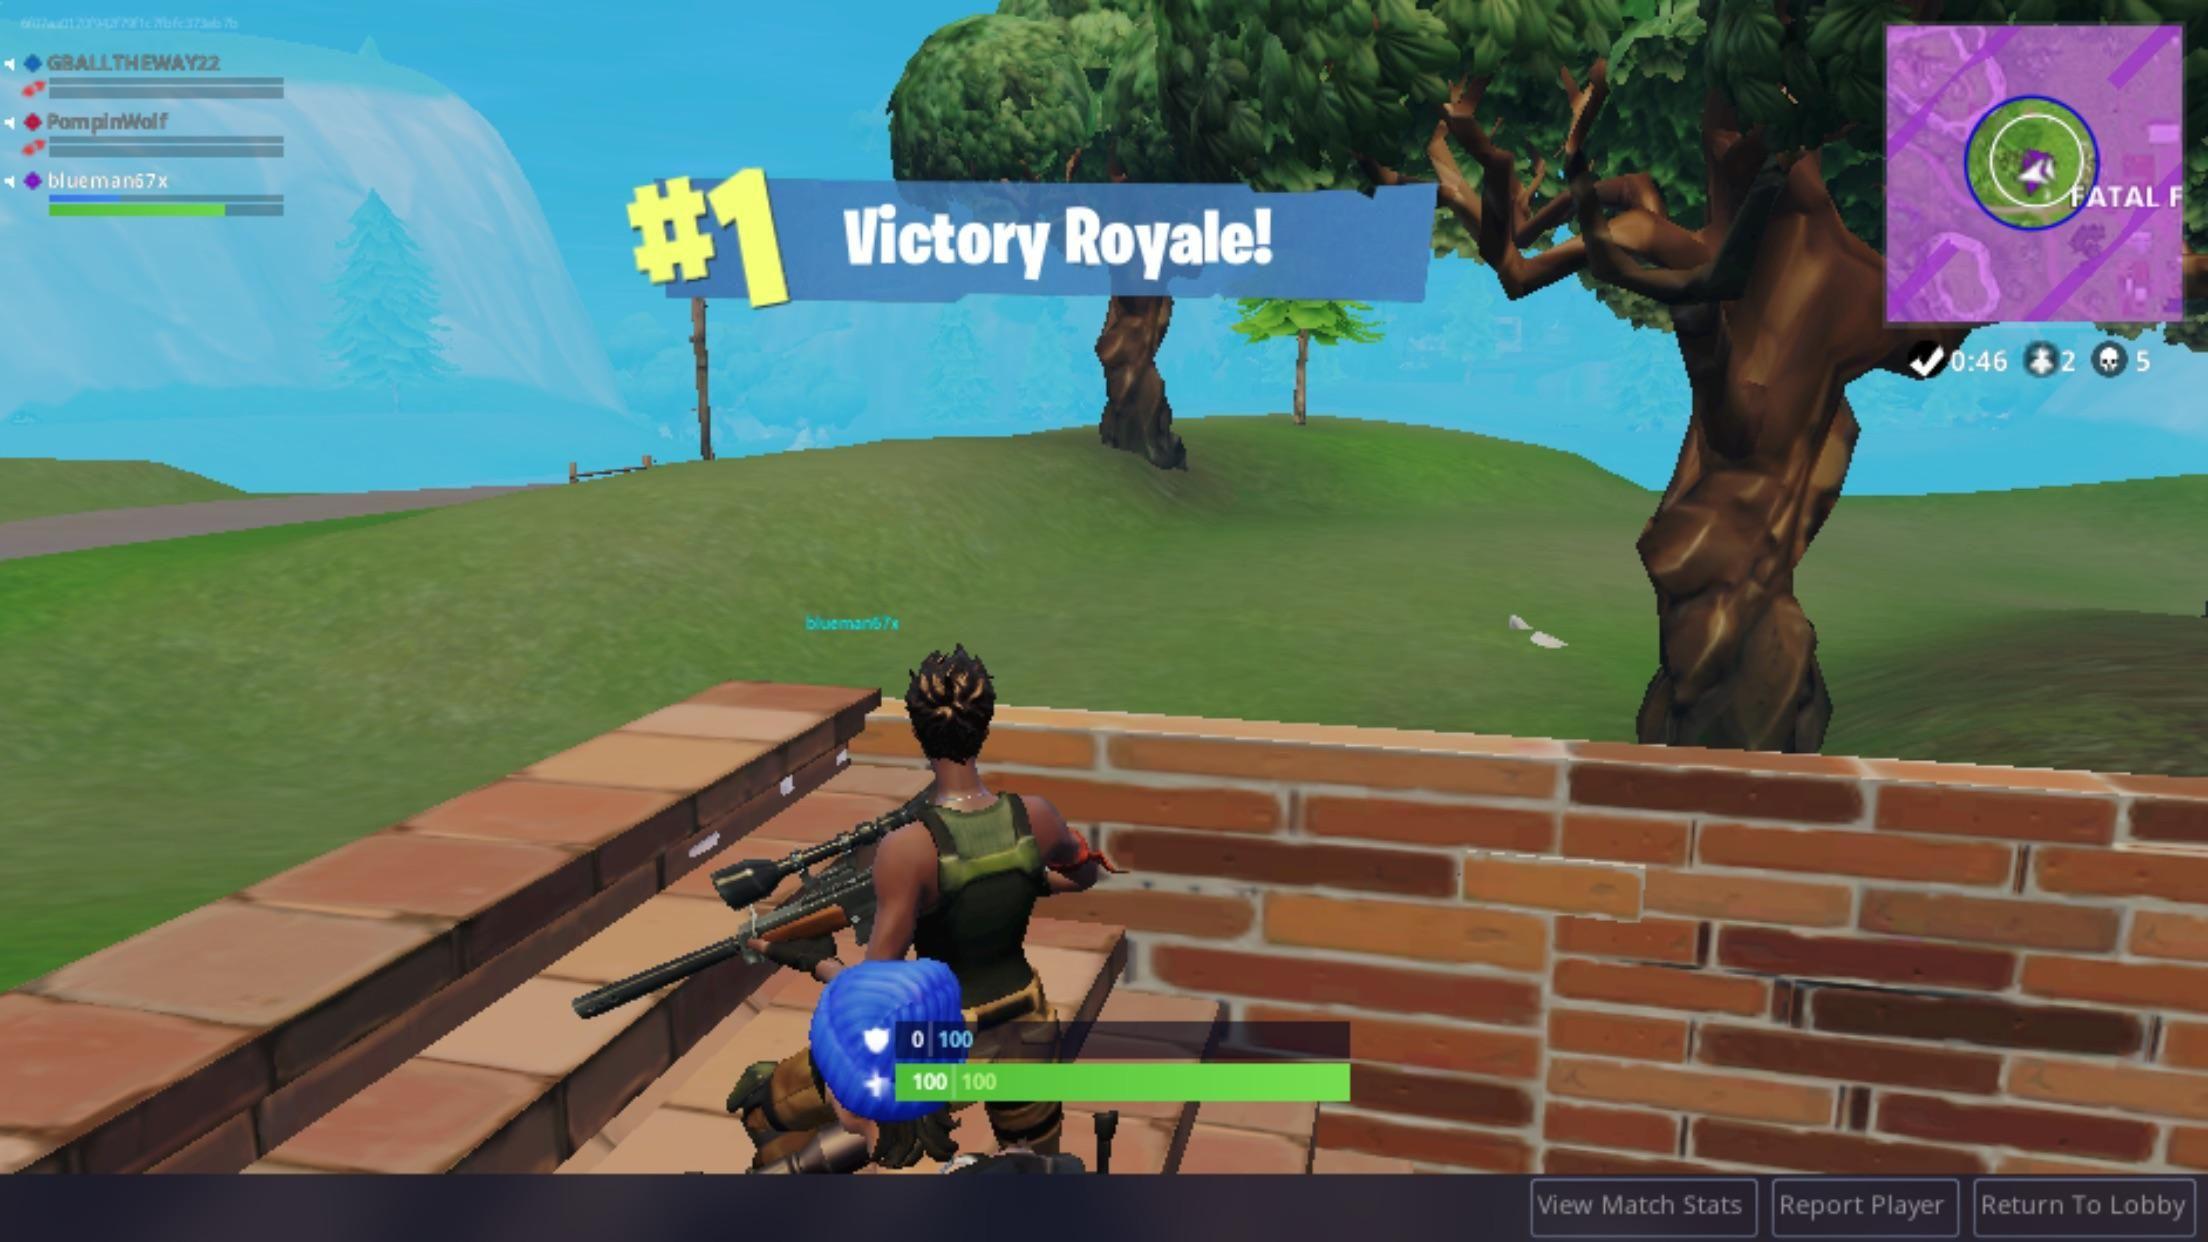 Fortnite mobile victory royale